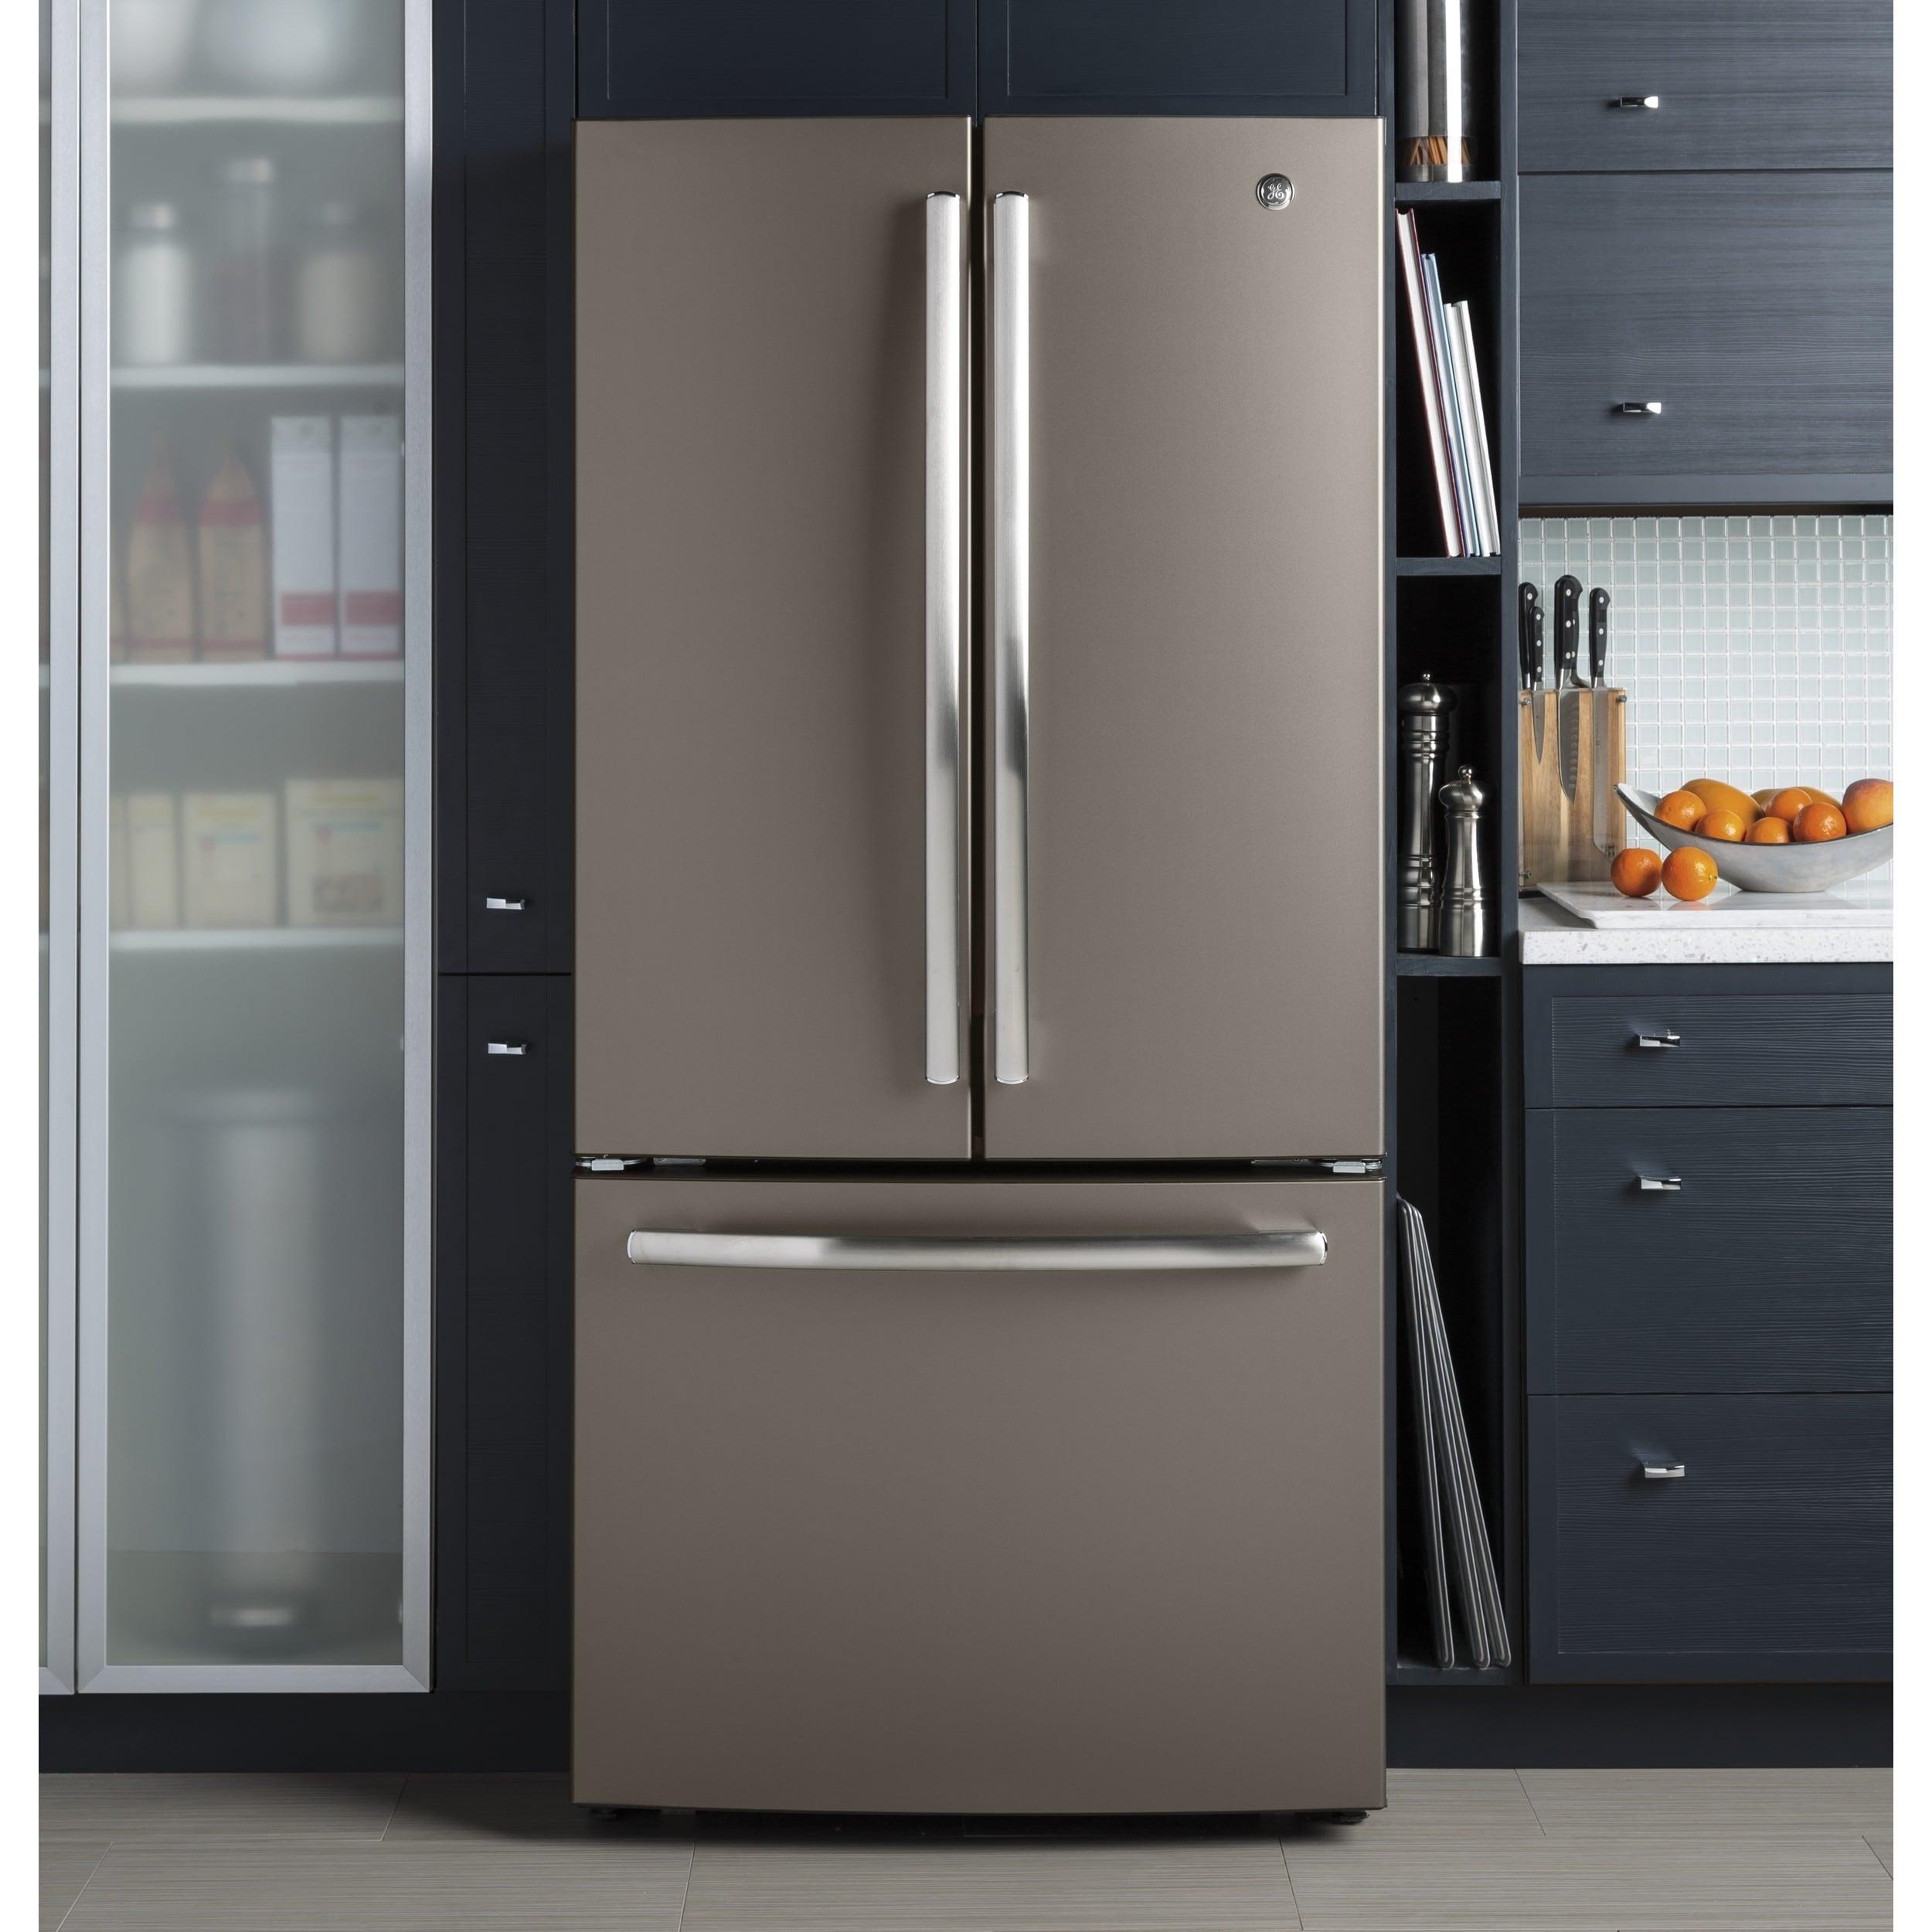 GE Series Energy Star 24.8 cubic foot French Door Refrigerator SLATE